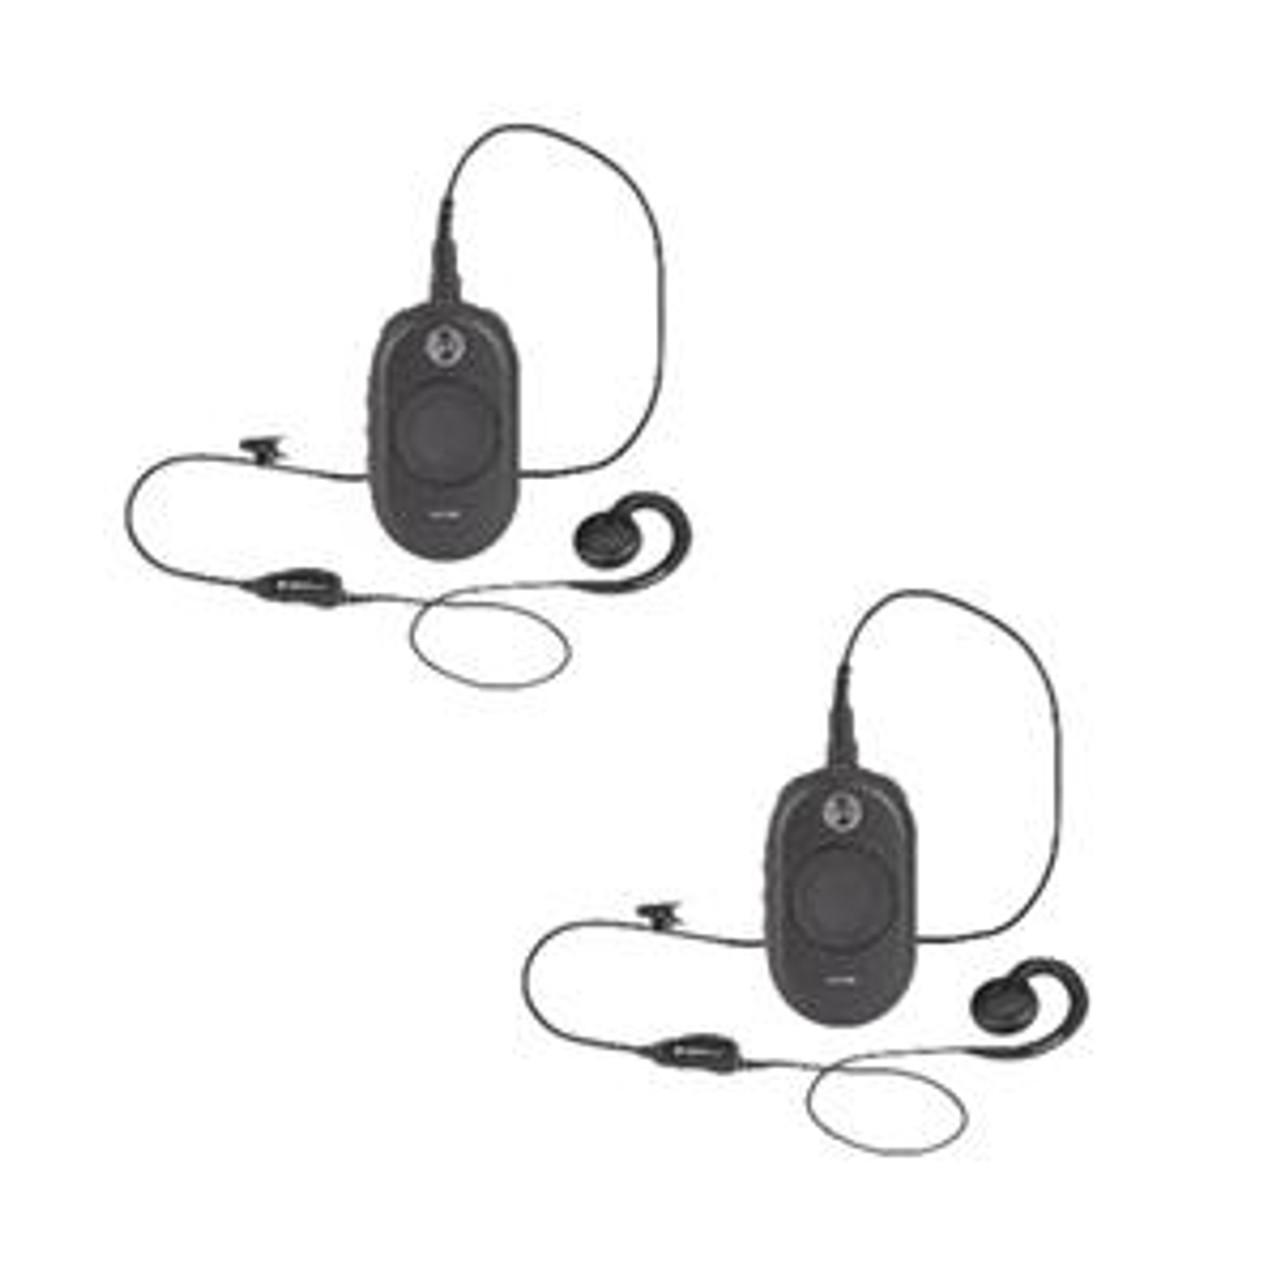 Motorola CLP1010 UHF 2 Way Radio Pack of 2